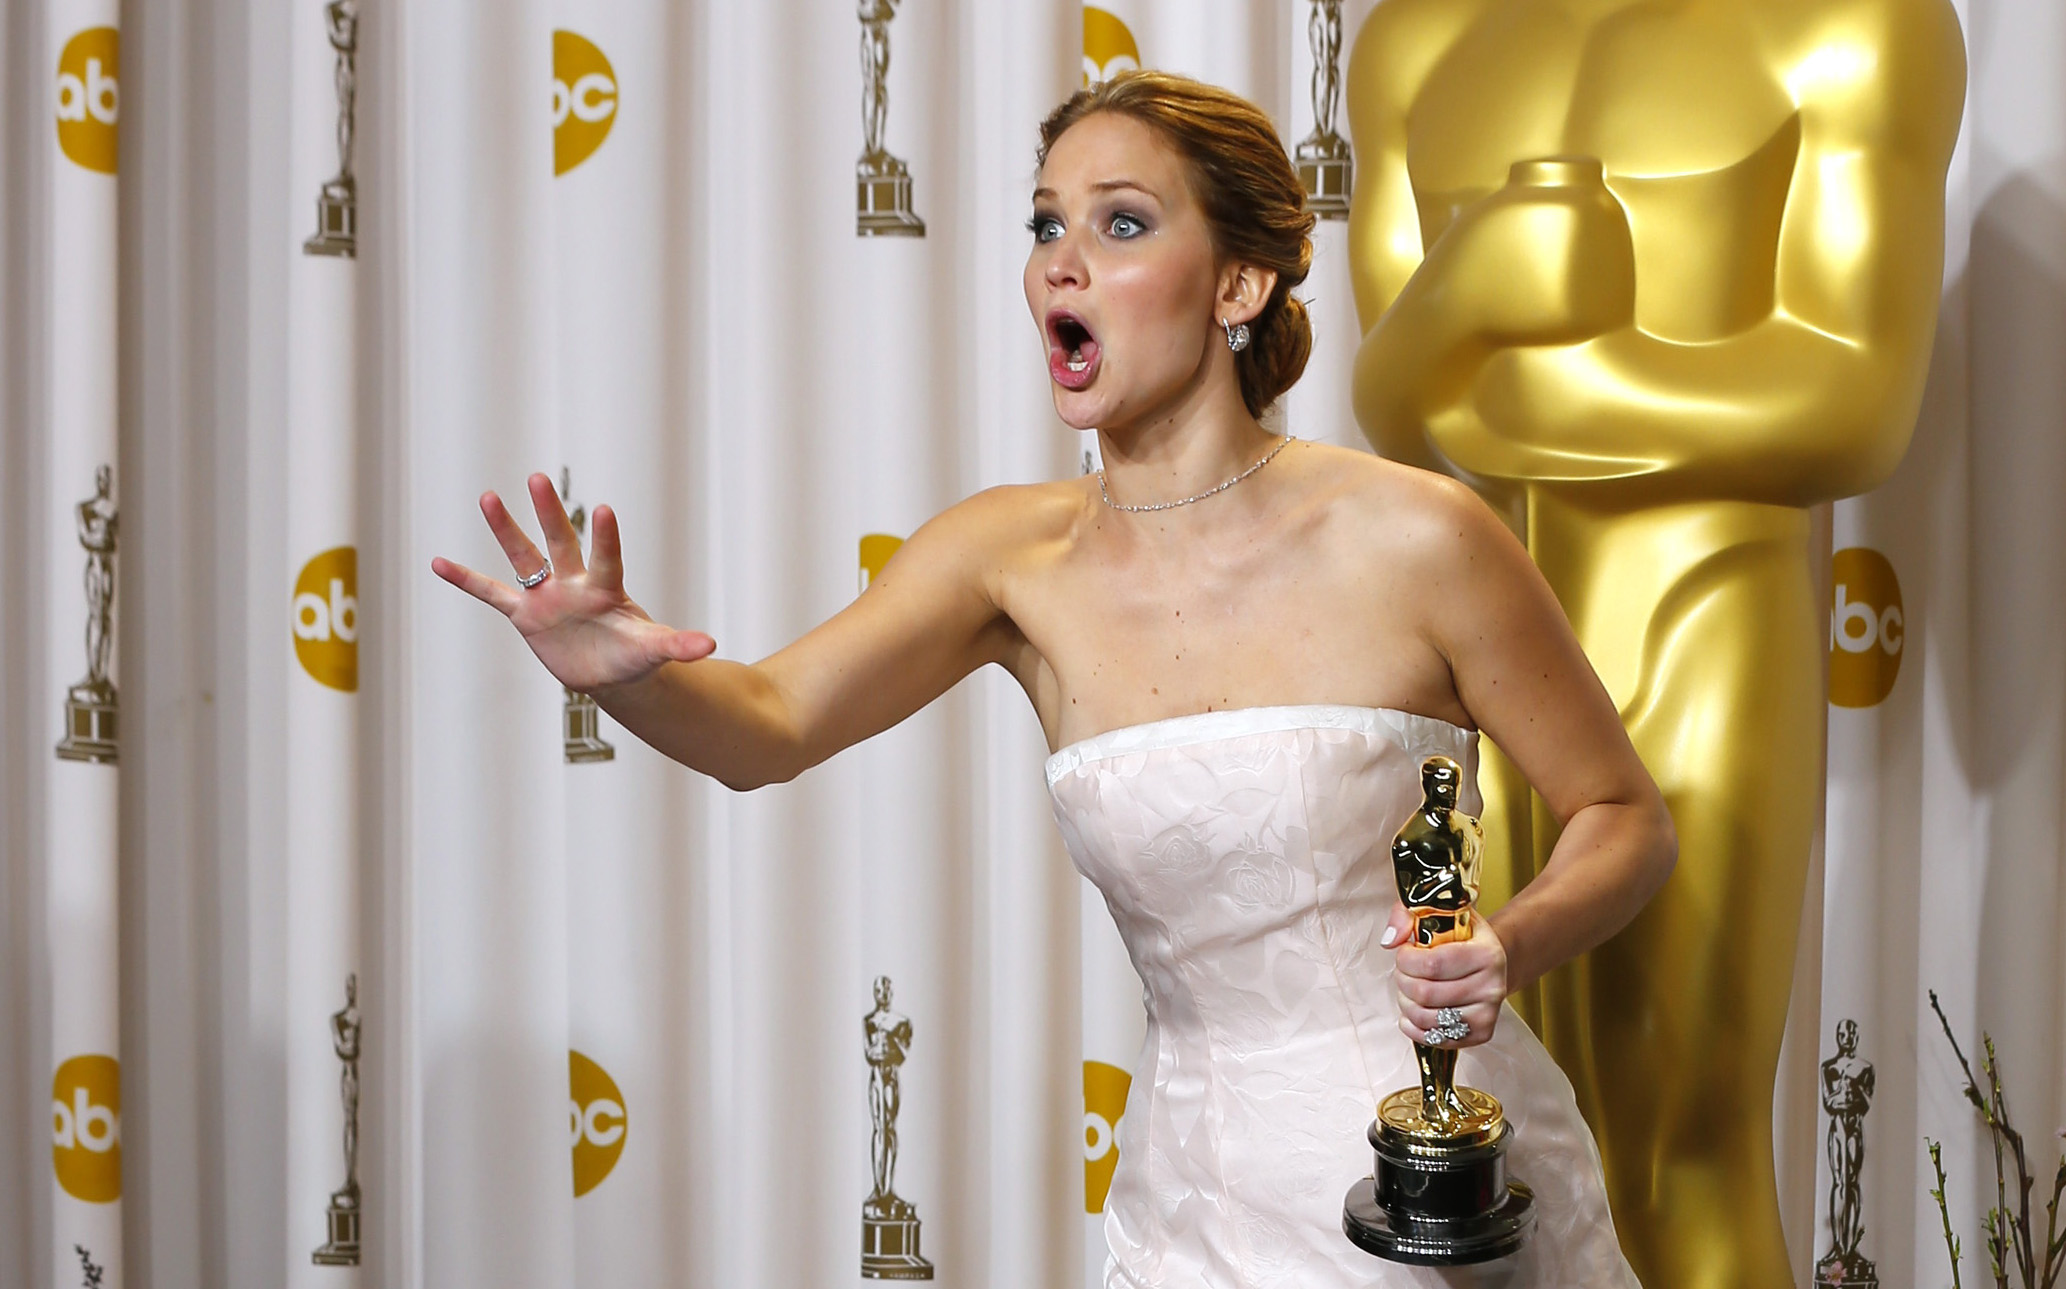 Jennifer Lawrence's moment: Trip, fall, win - Emirates 24|7